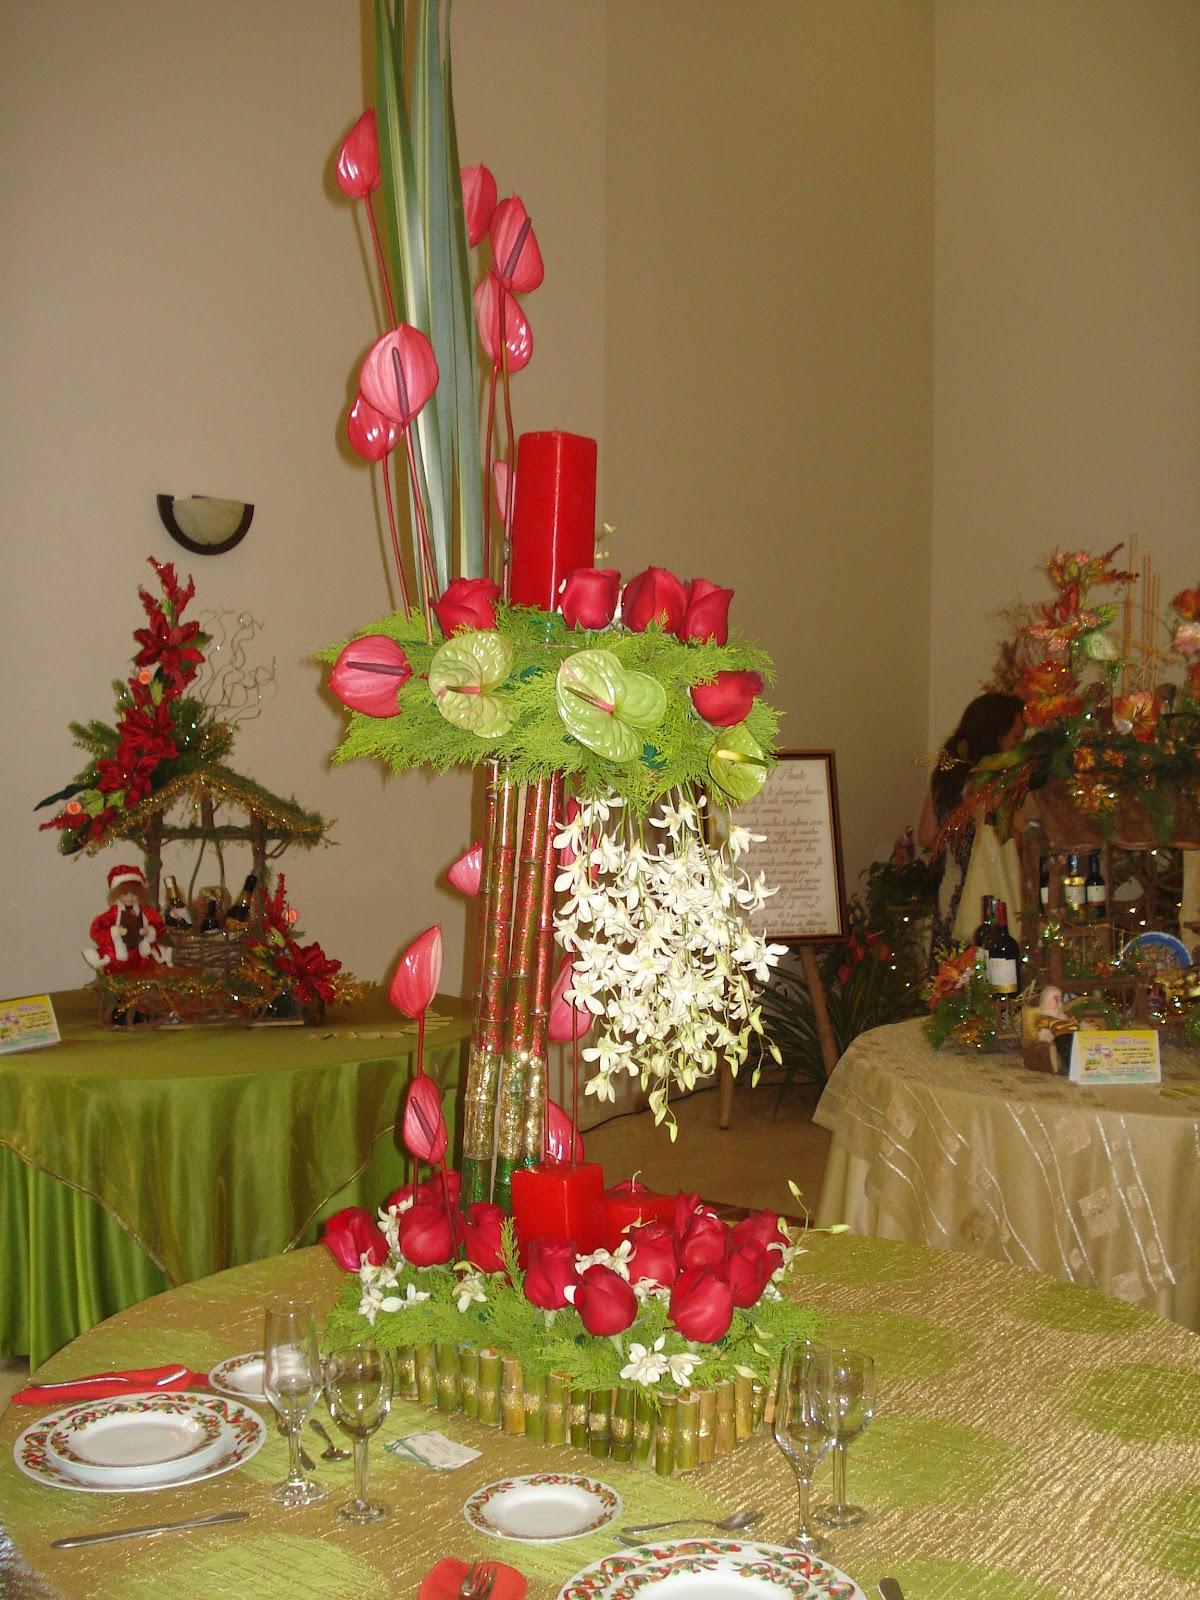 Decoraci n floral aura rosa camacho arreglos navide os parte2 - Camacho decoracion ...